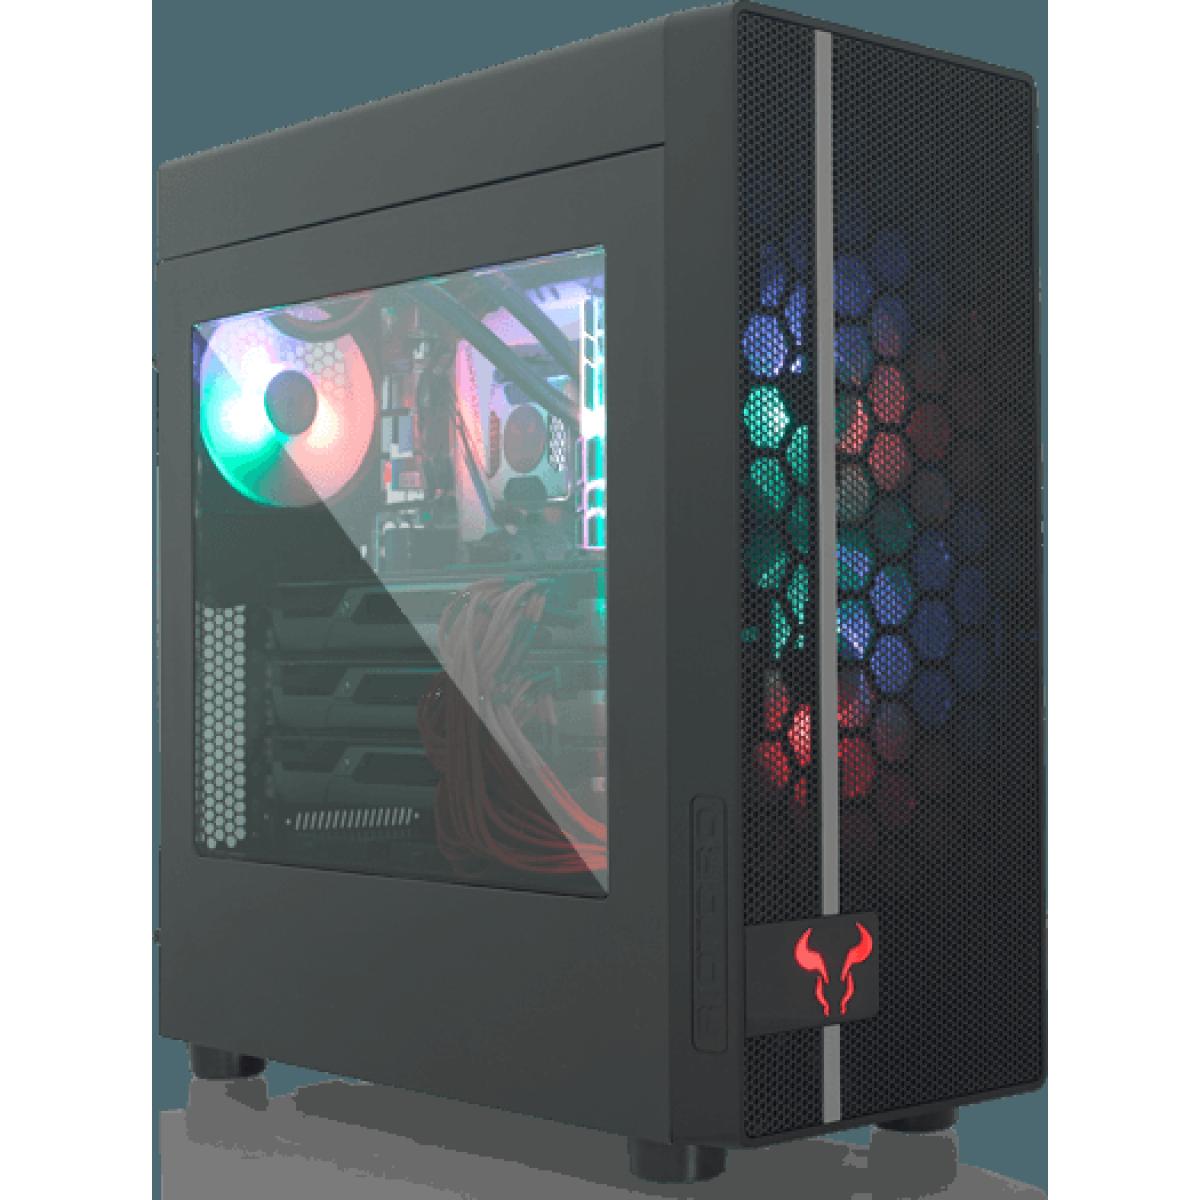 Pc Gamer T-Power Warlord Lvl-4 AMD Ryzen 7 3700X / GeForce RTX 2070 Super / DDR4 16GB / HD 1TB / 600W